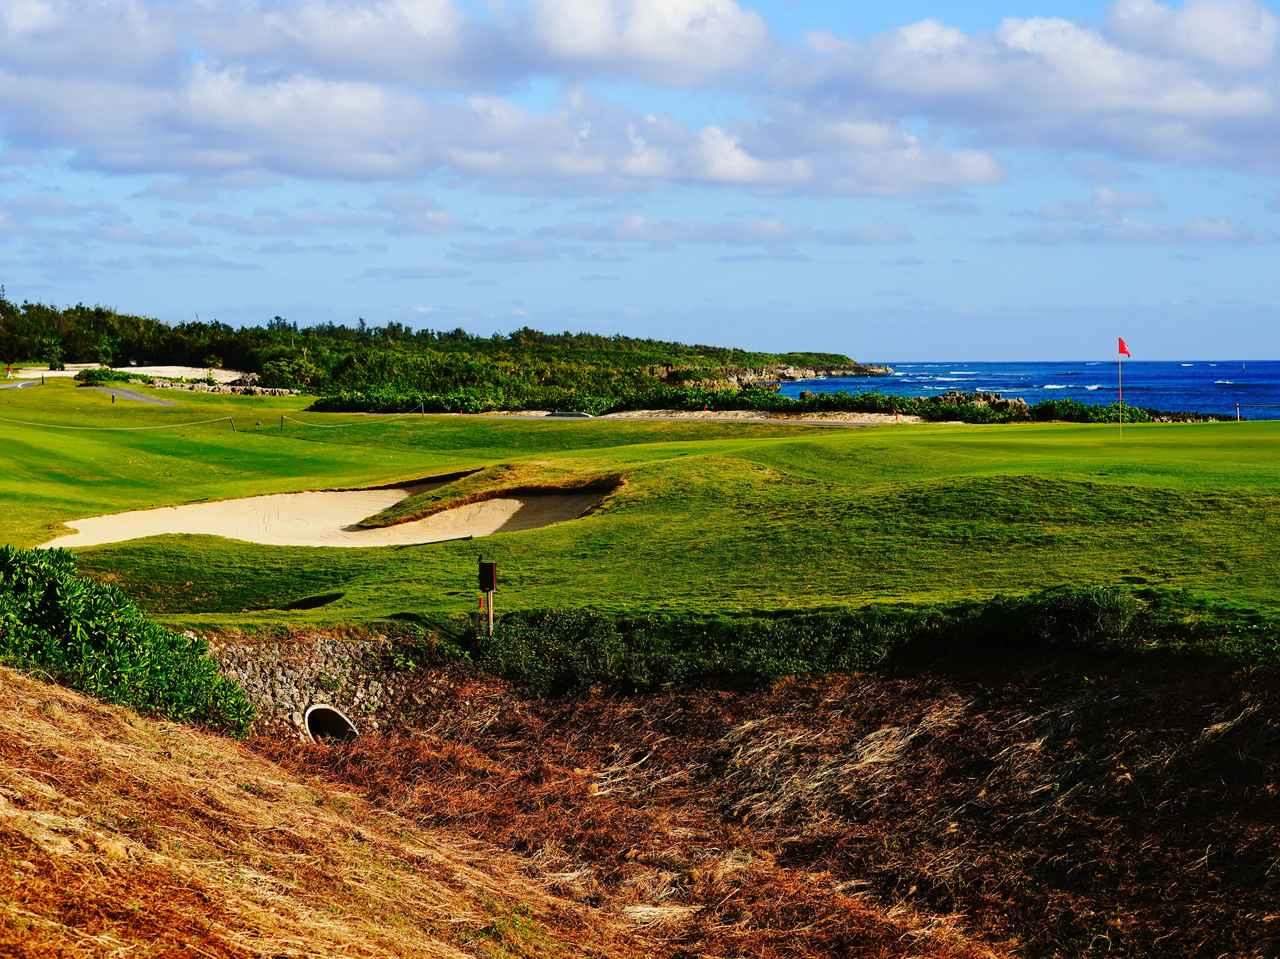 Images : 6番目の画像 - エメラルドコーストゴルフリンクス - ゴルフへ行こうWEB by ゴルフダイジェスト